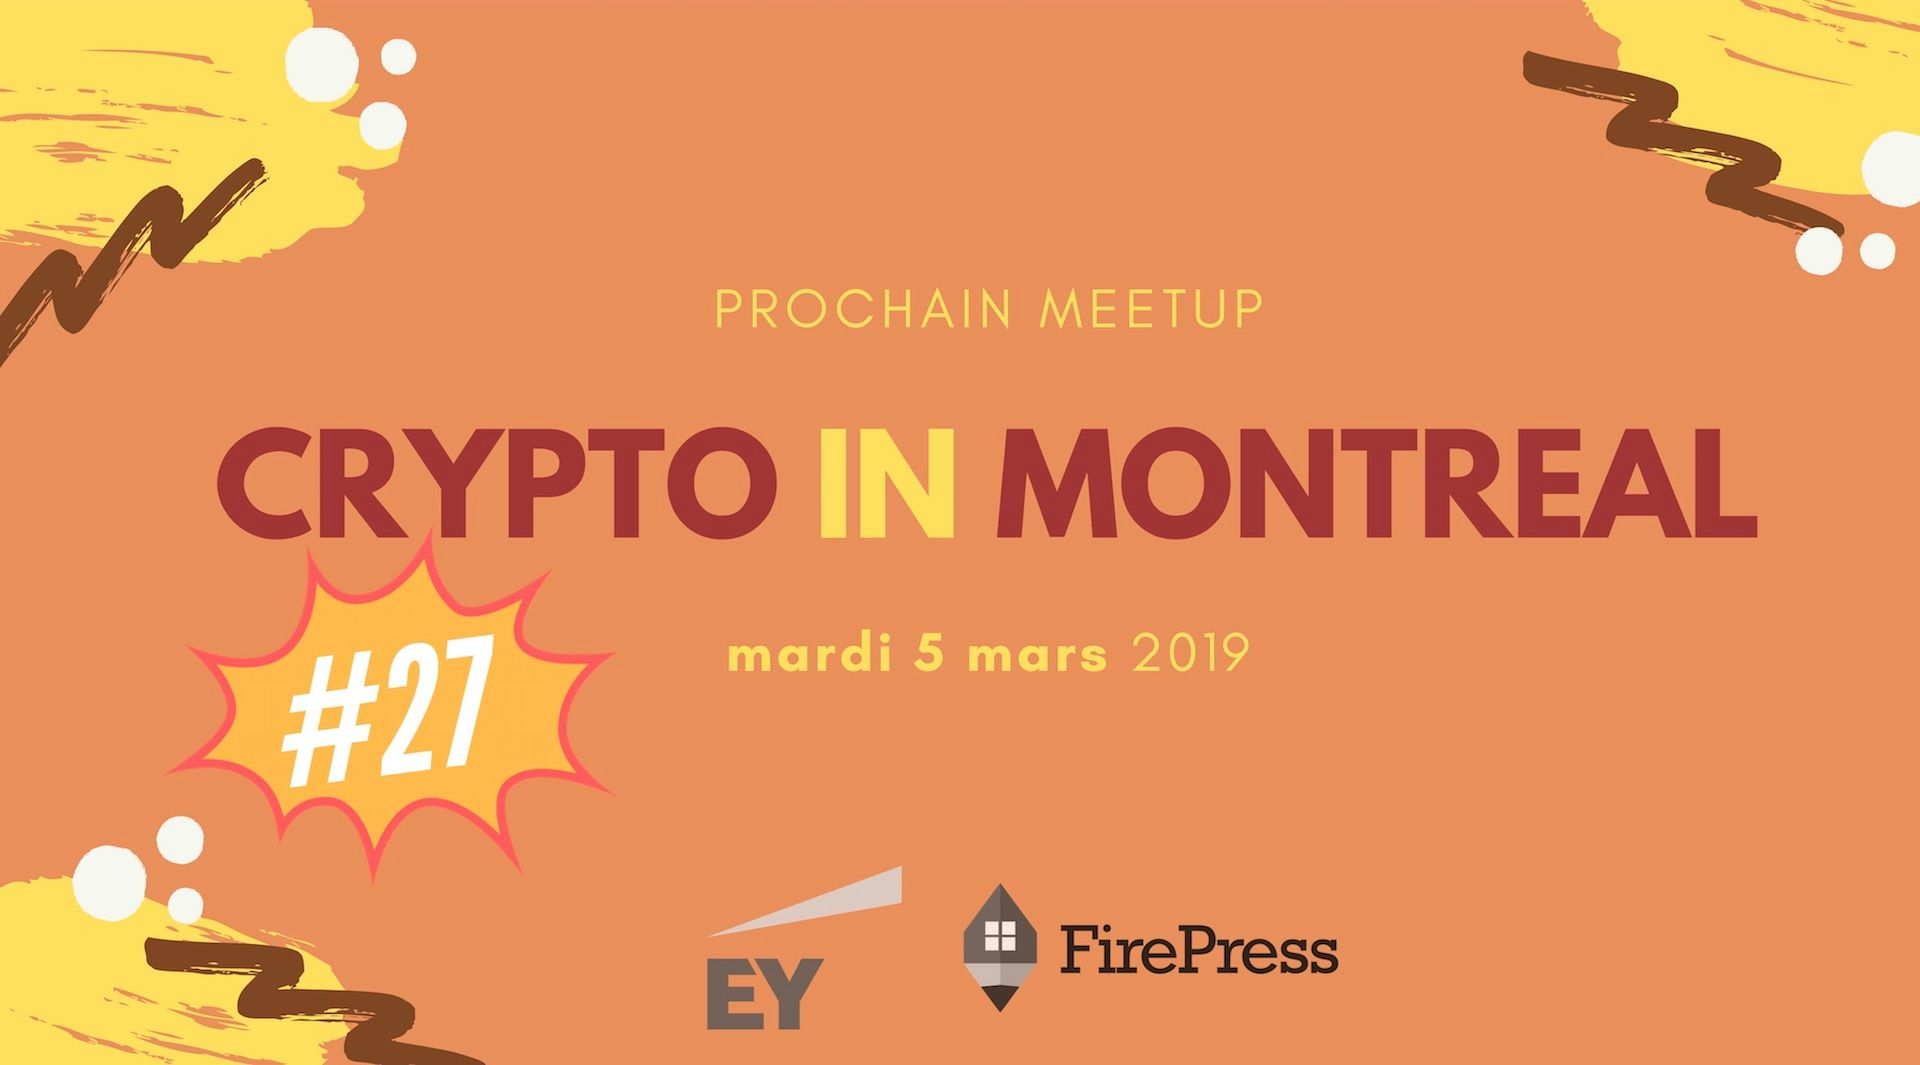 Le Bitcoin et les Altcoins, une introduction au monde des cryptos | CryptoInMontreal #27